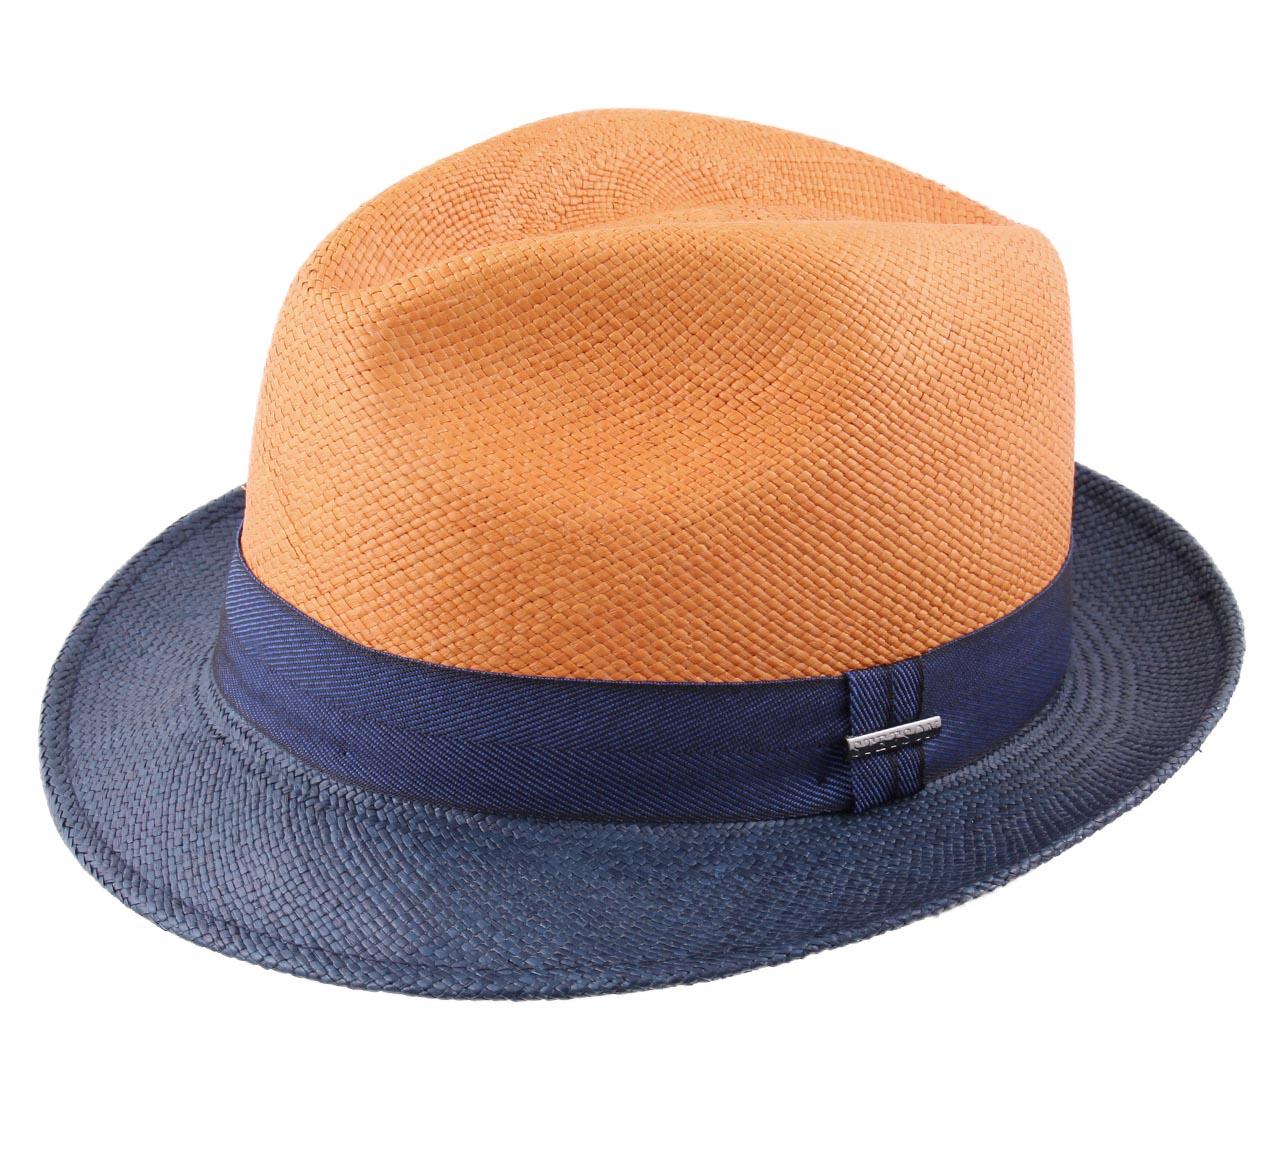 967670a1a77f Twotone 2/3 - Hats Stetson